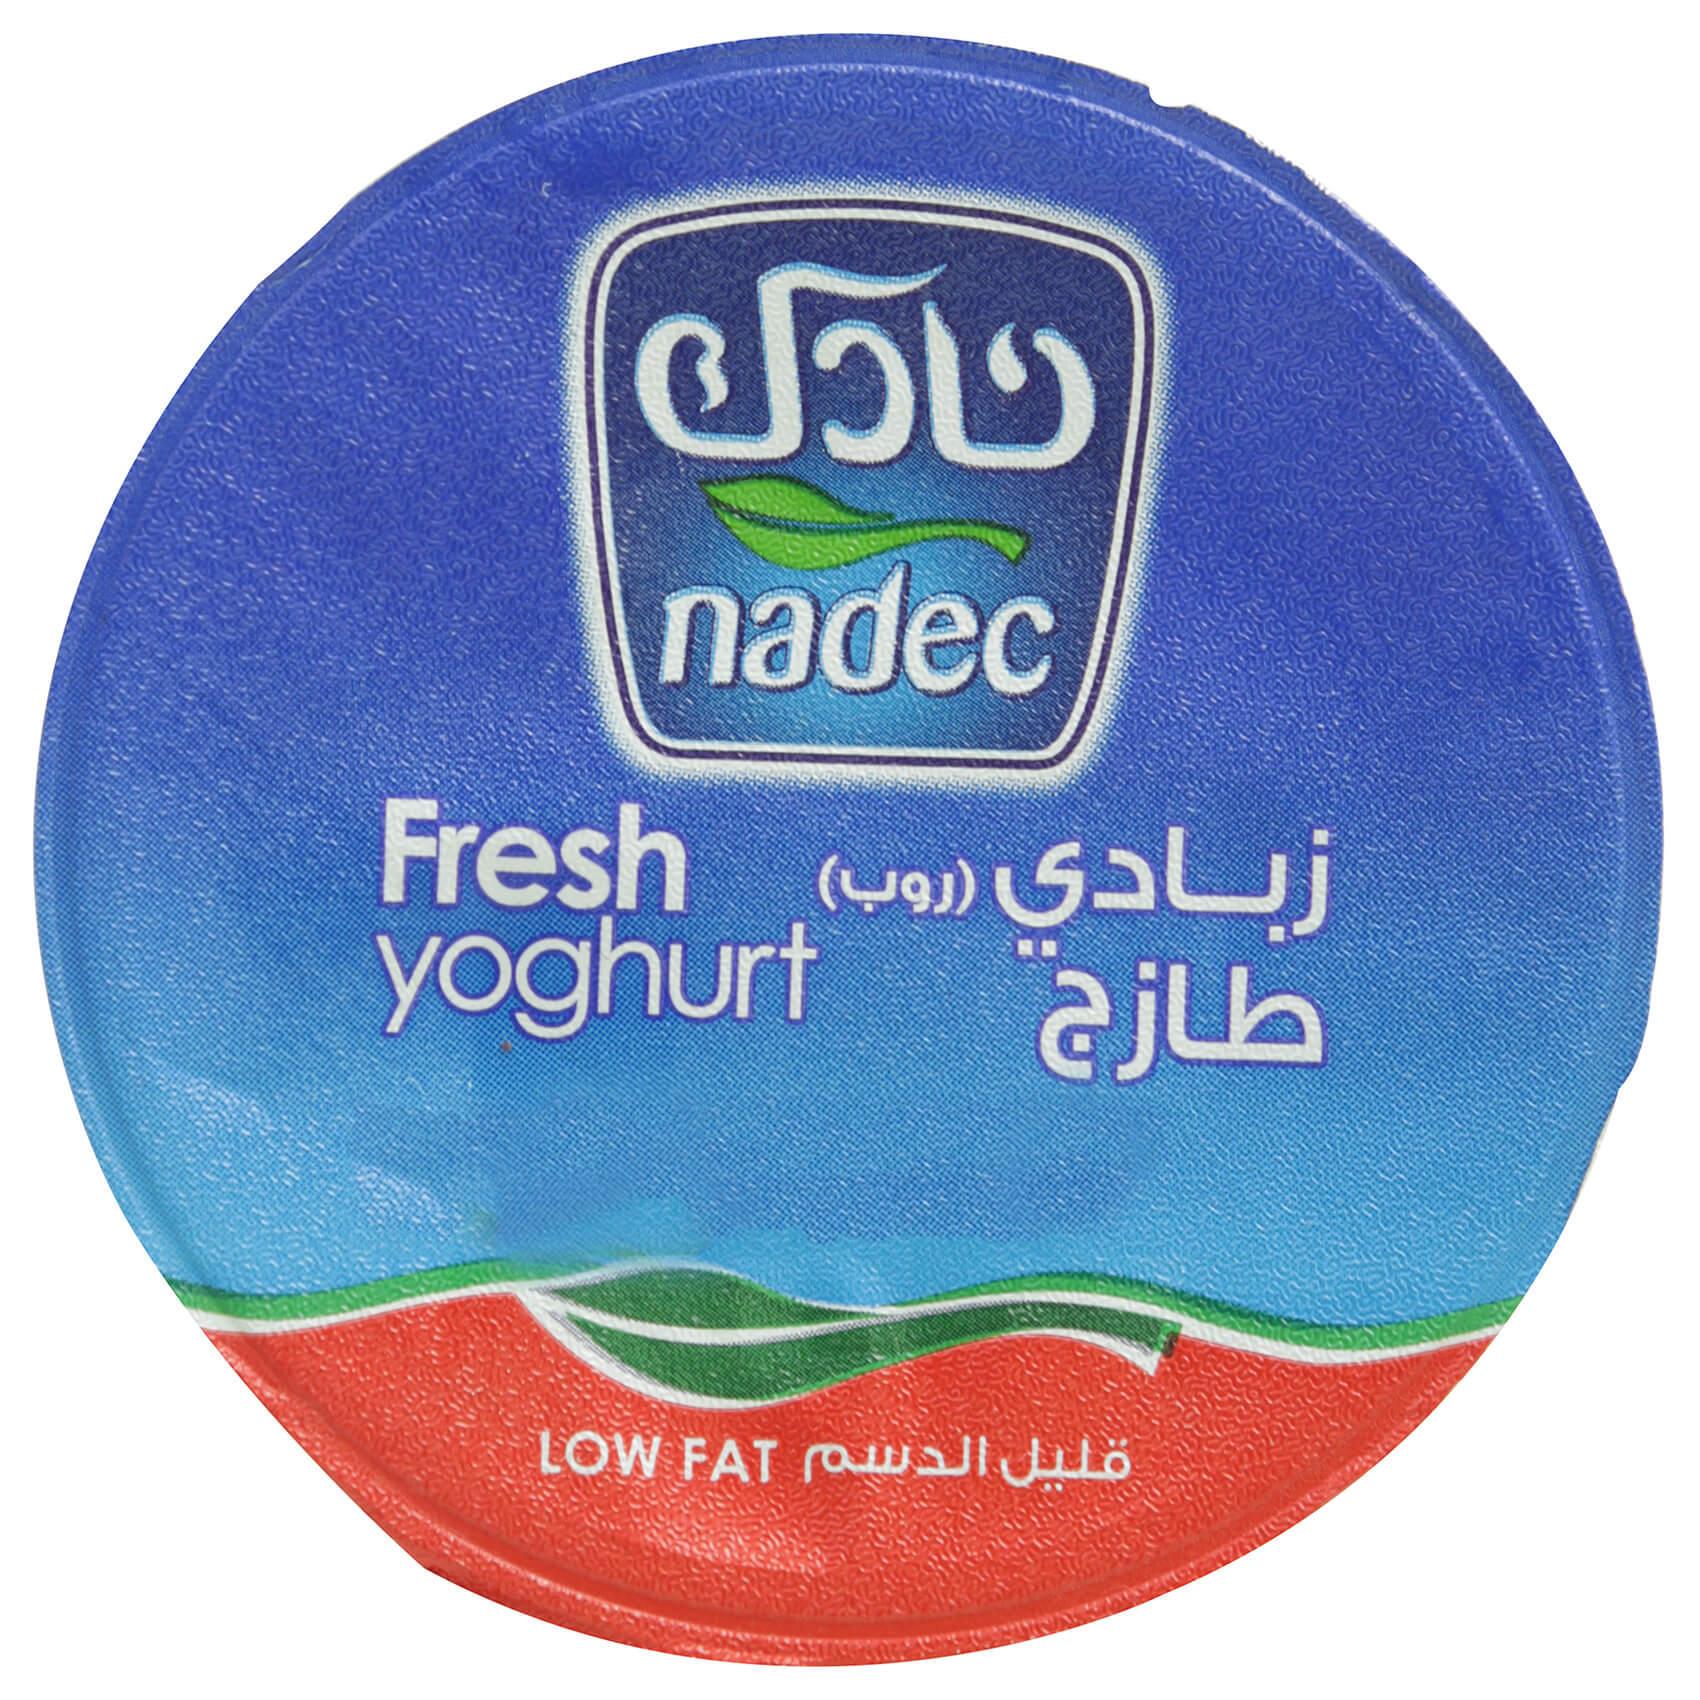 NADEC YOG PLAIN LF 170G